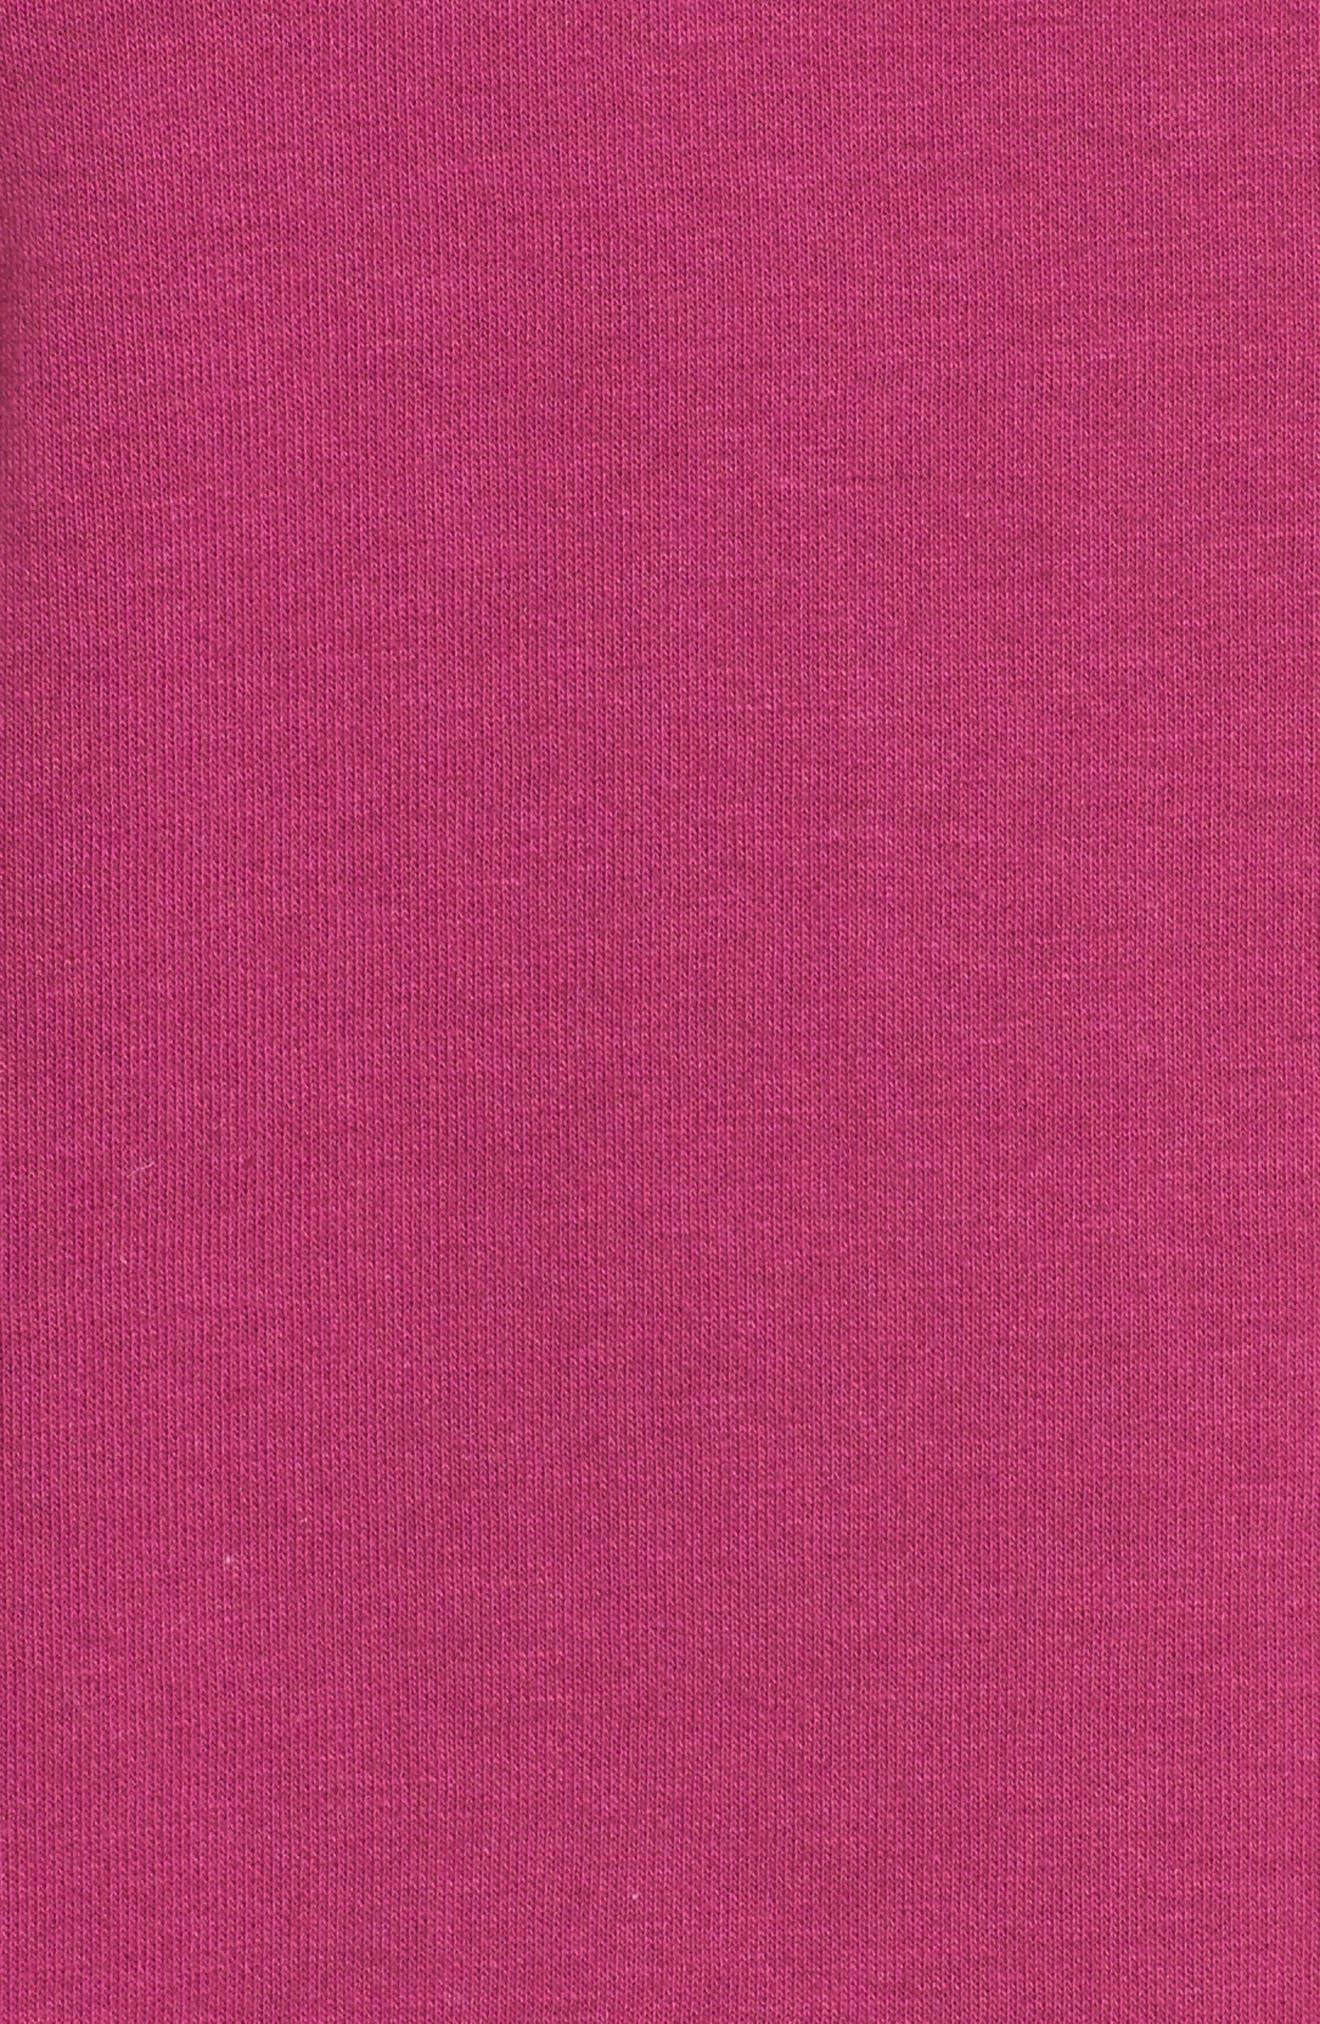 Blouson Sleeve Sweatshirt,                             Alternate thumbnail 25, color,